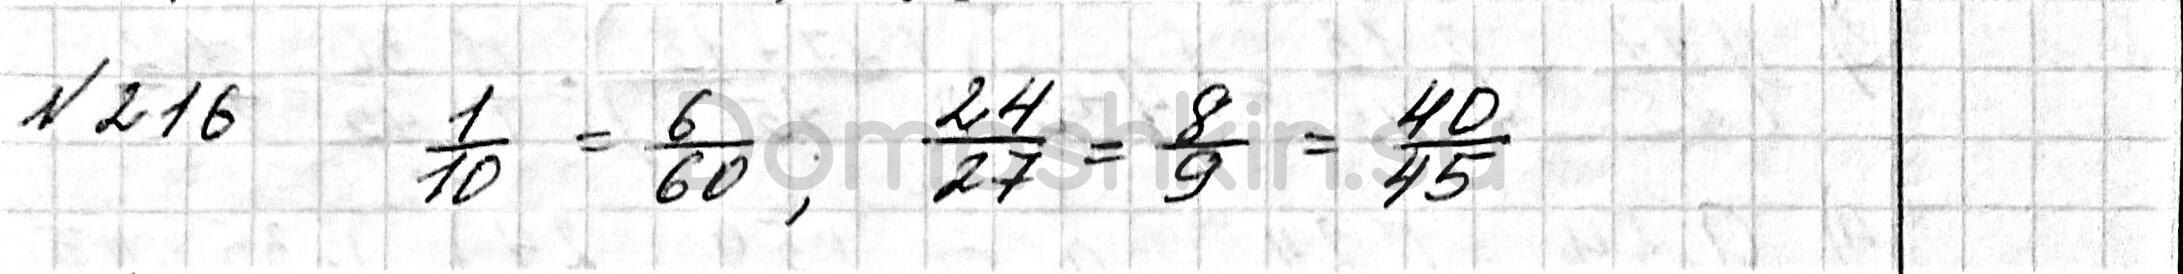 Математика 6 класс учебник Мерзляк номер 216 решение